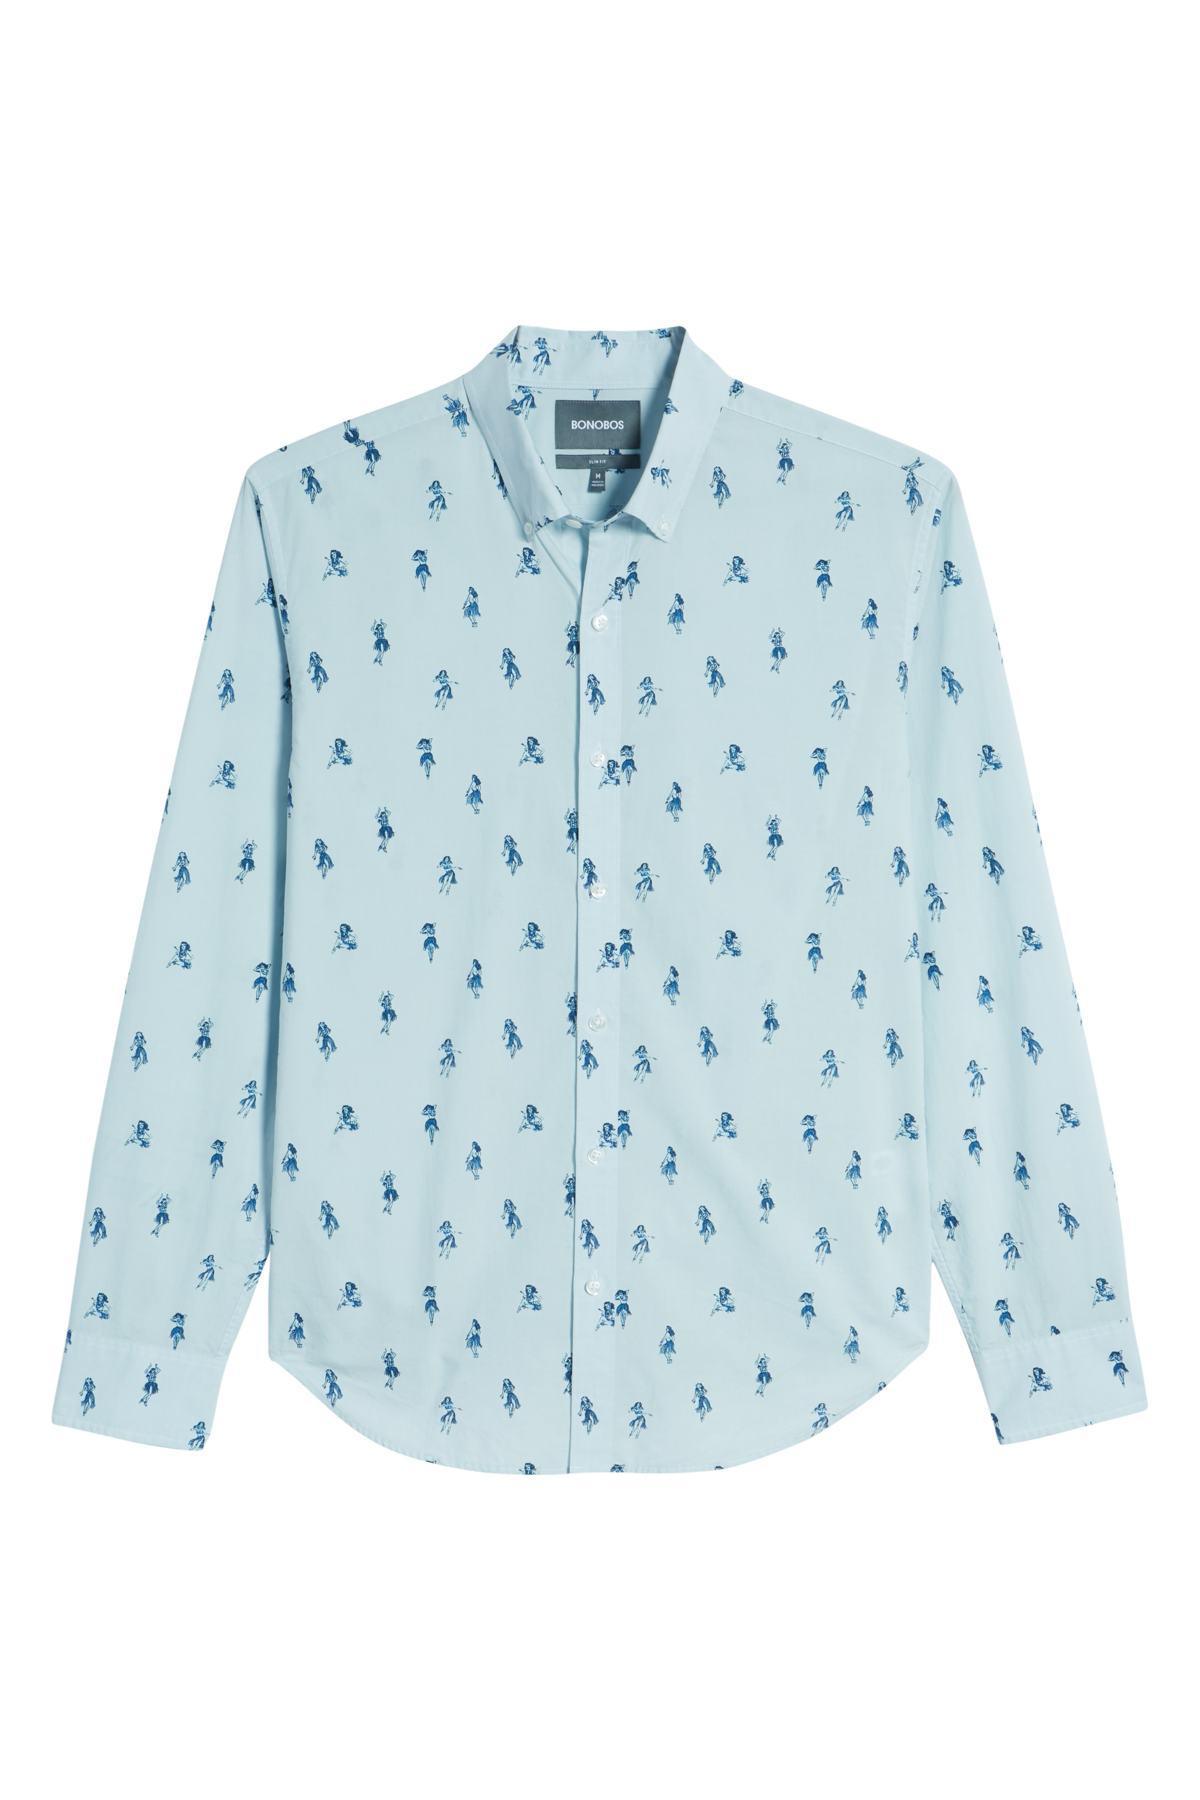 573ccf79db8 Bonobos - Blue Summerweight Slim Fit Hula Print Sport Shirt for Men - Lyst.  View fullscreen